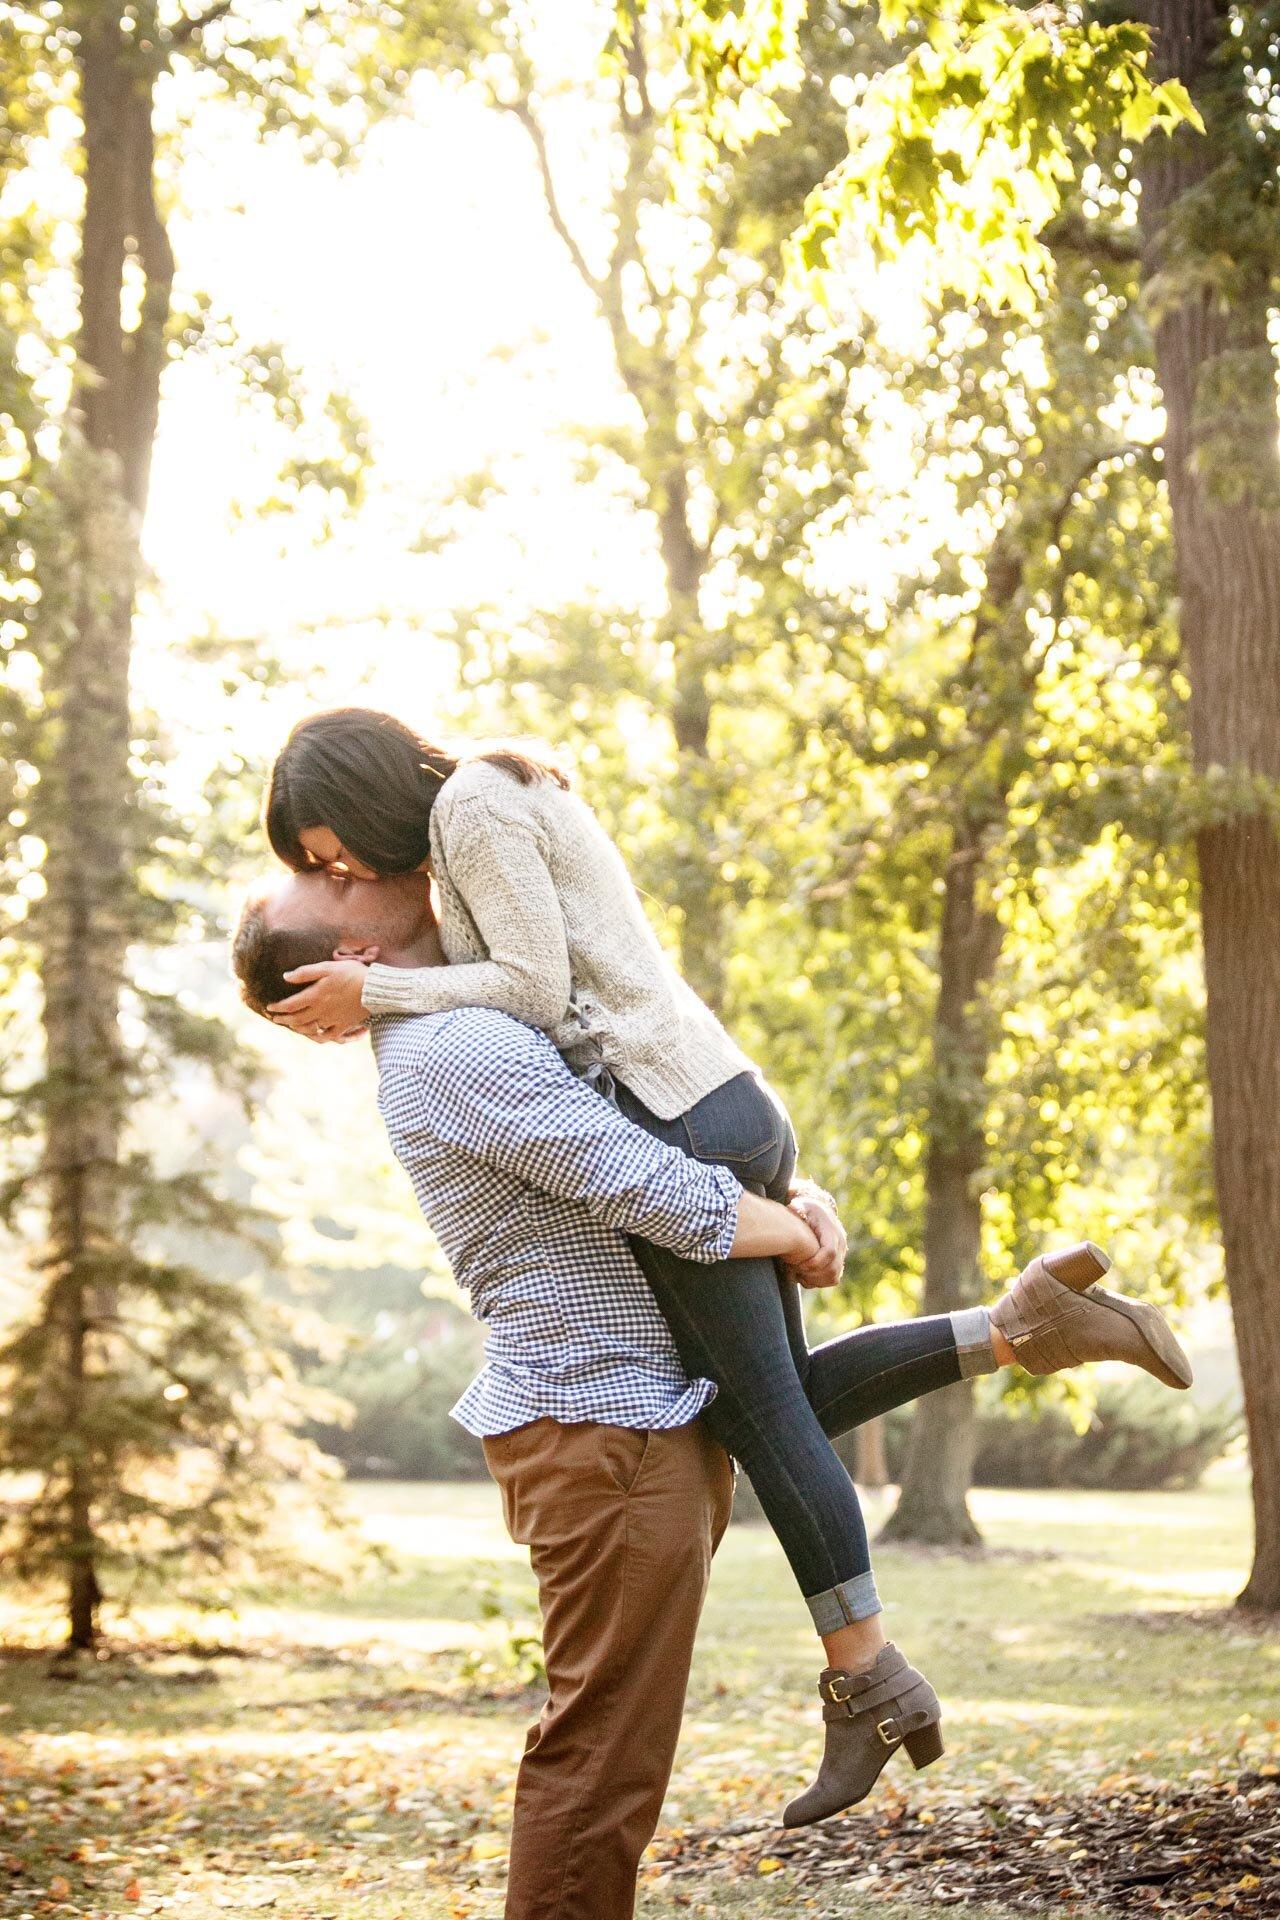 adam-shea-photography-fall-autumn-lighting-engagement-wedding-photos-adam-shea-photography-green-bay-appleton-neenah-photographer-04.jpg